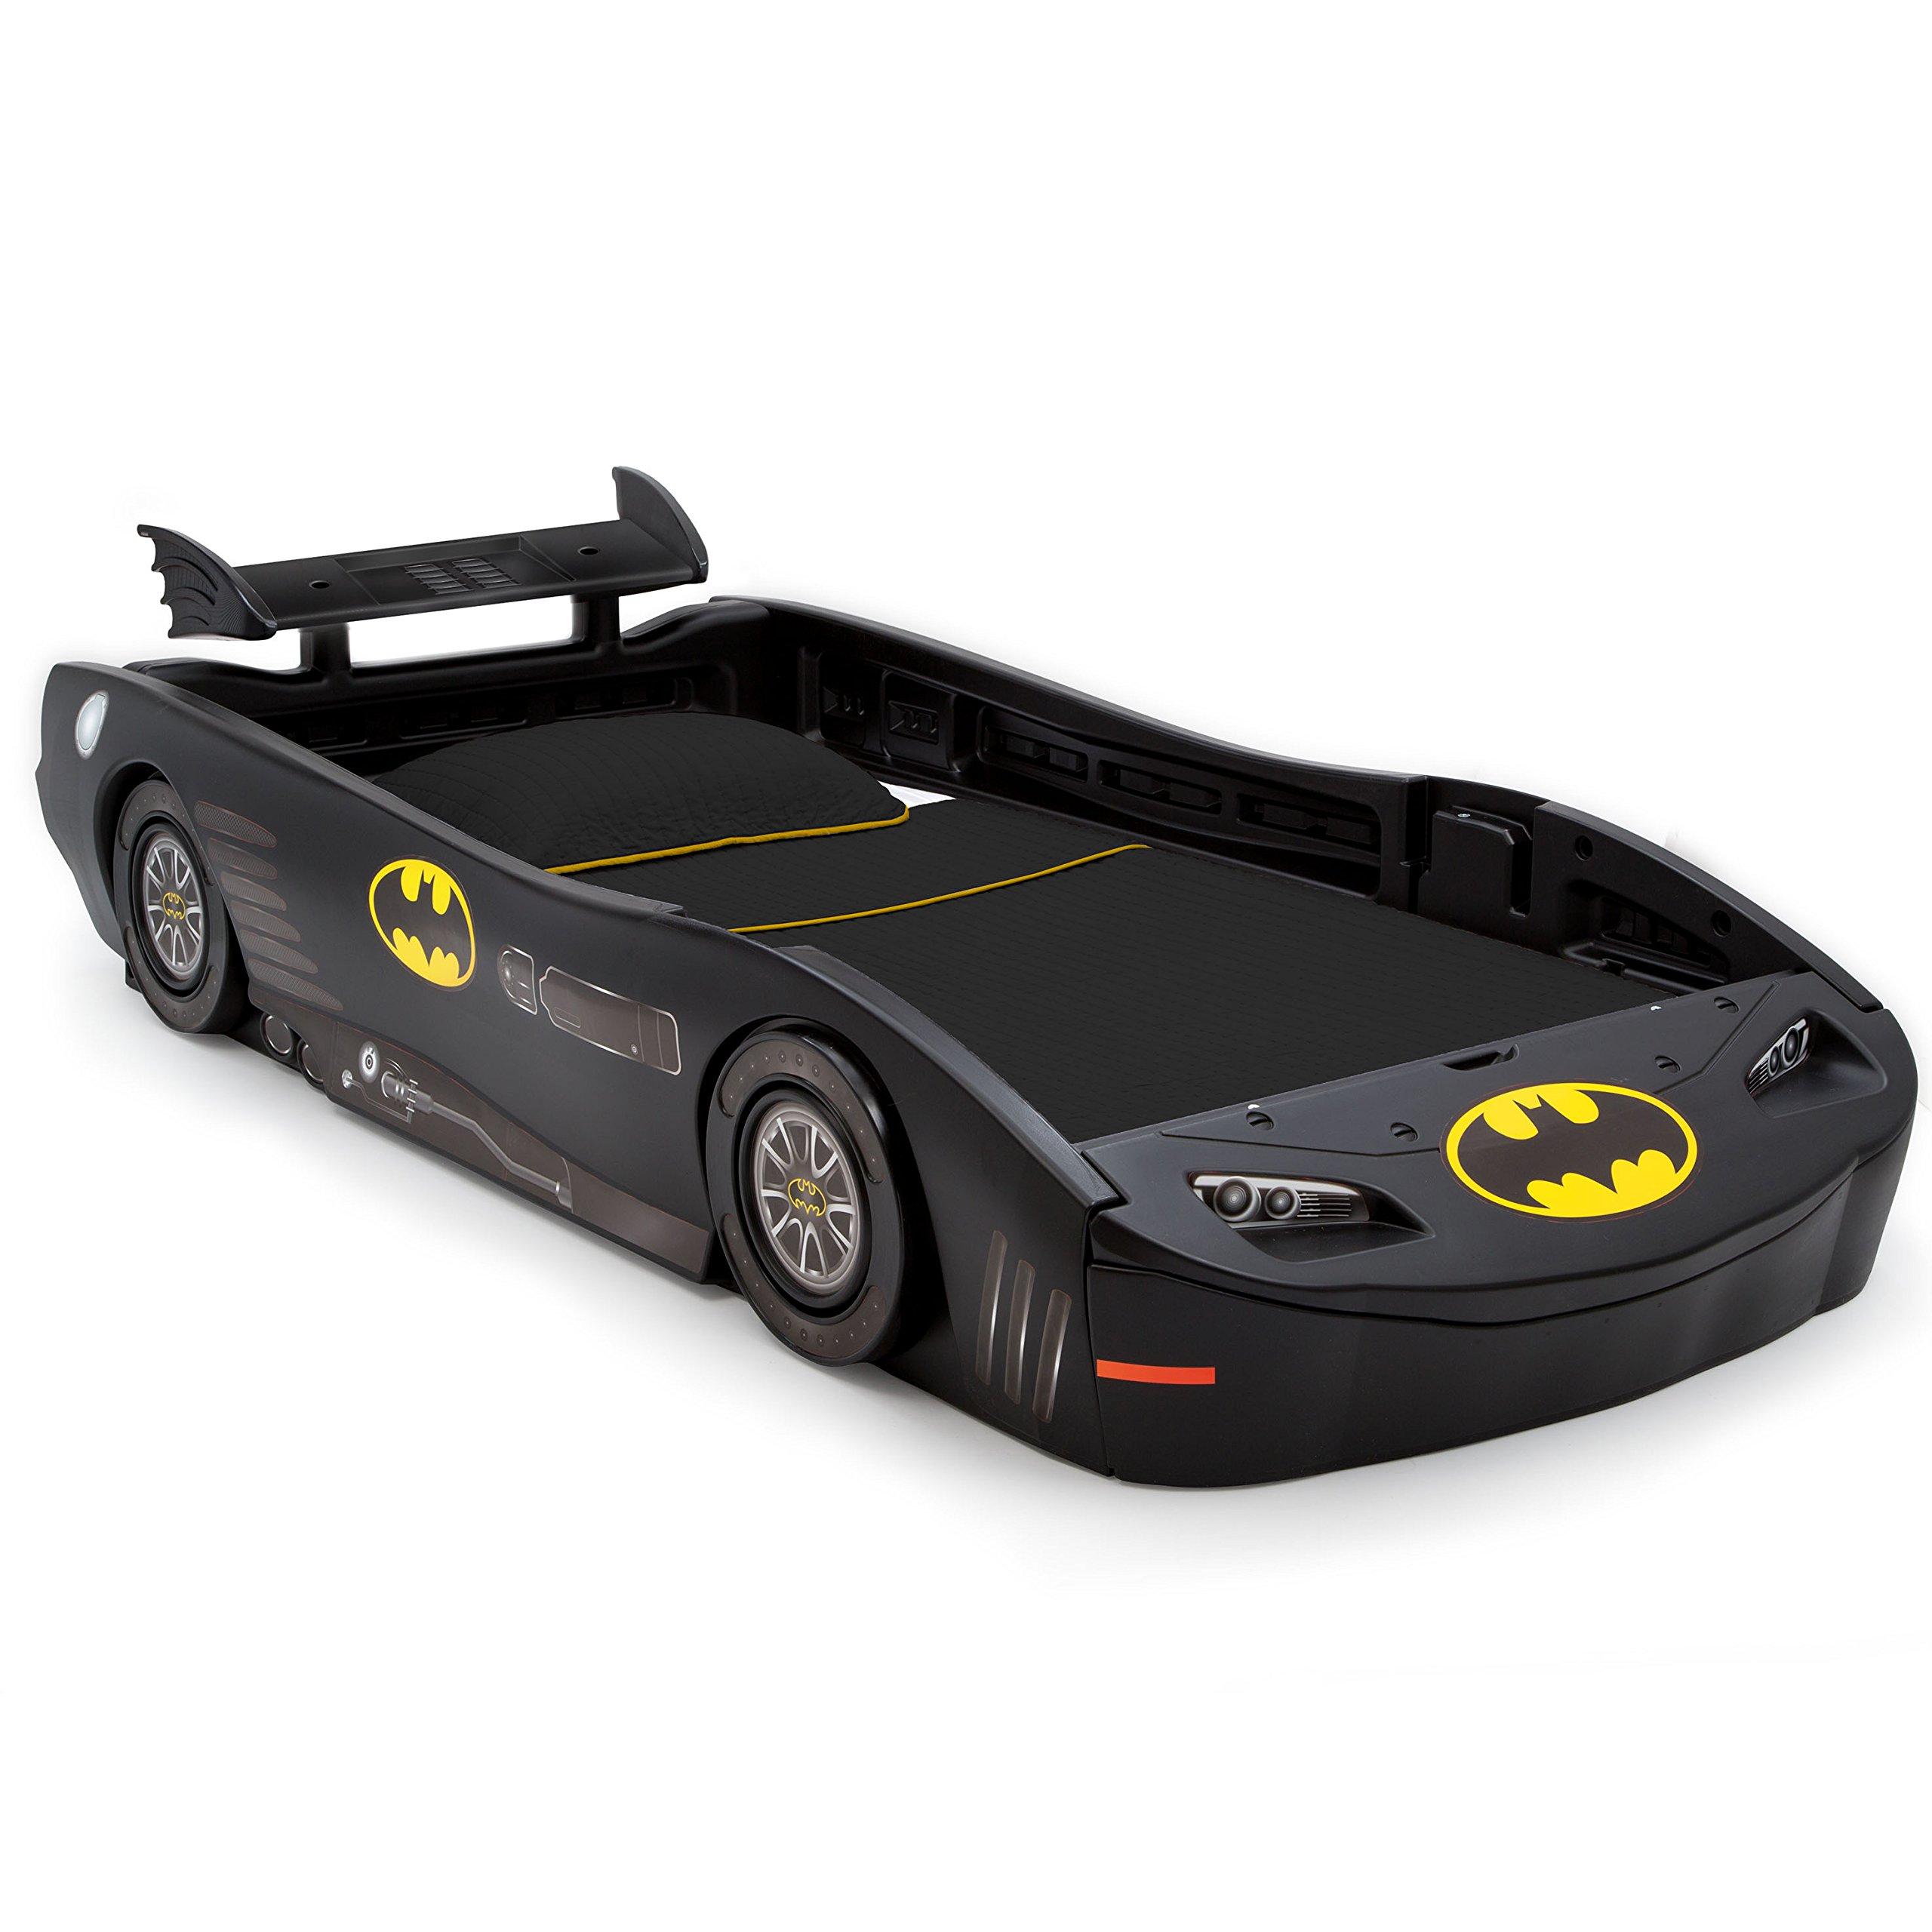 DC Comics Batman Batmobile Car Twin Bed by Delta Children by Delta Children